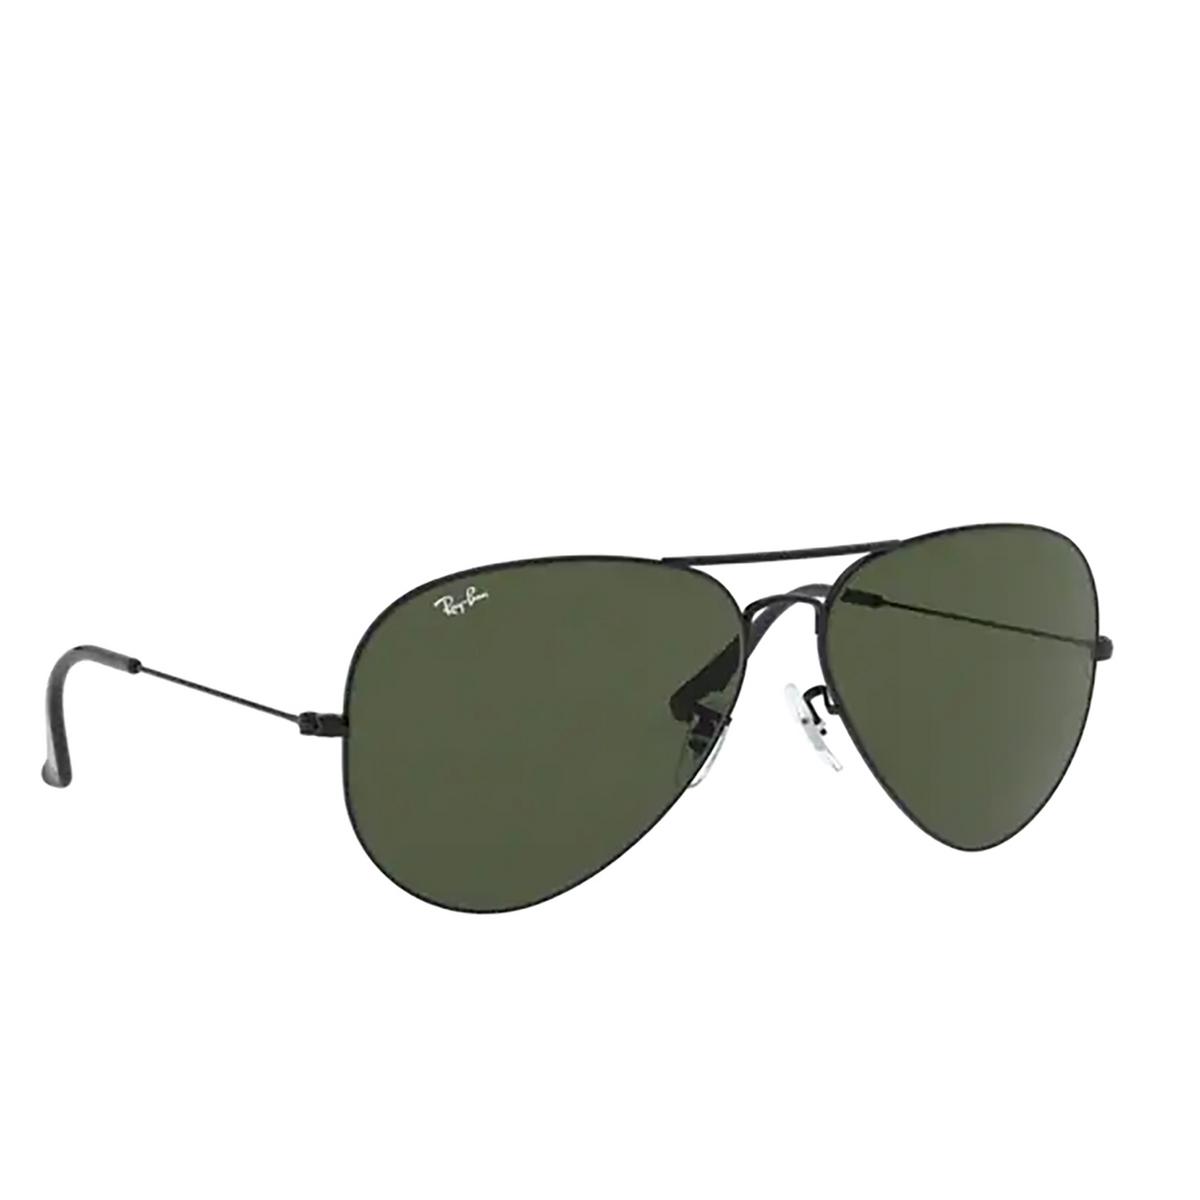 Ray-Ban® Aviator Sunglasses: Aviator Large Metal Ii RB3026 color Black L2821 - 2/3.